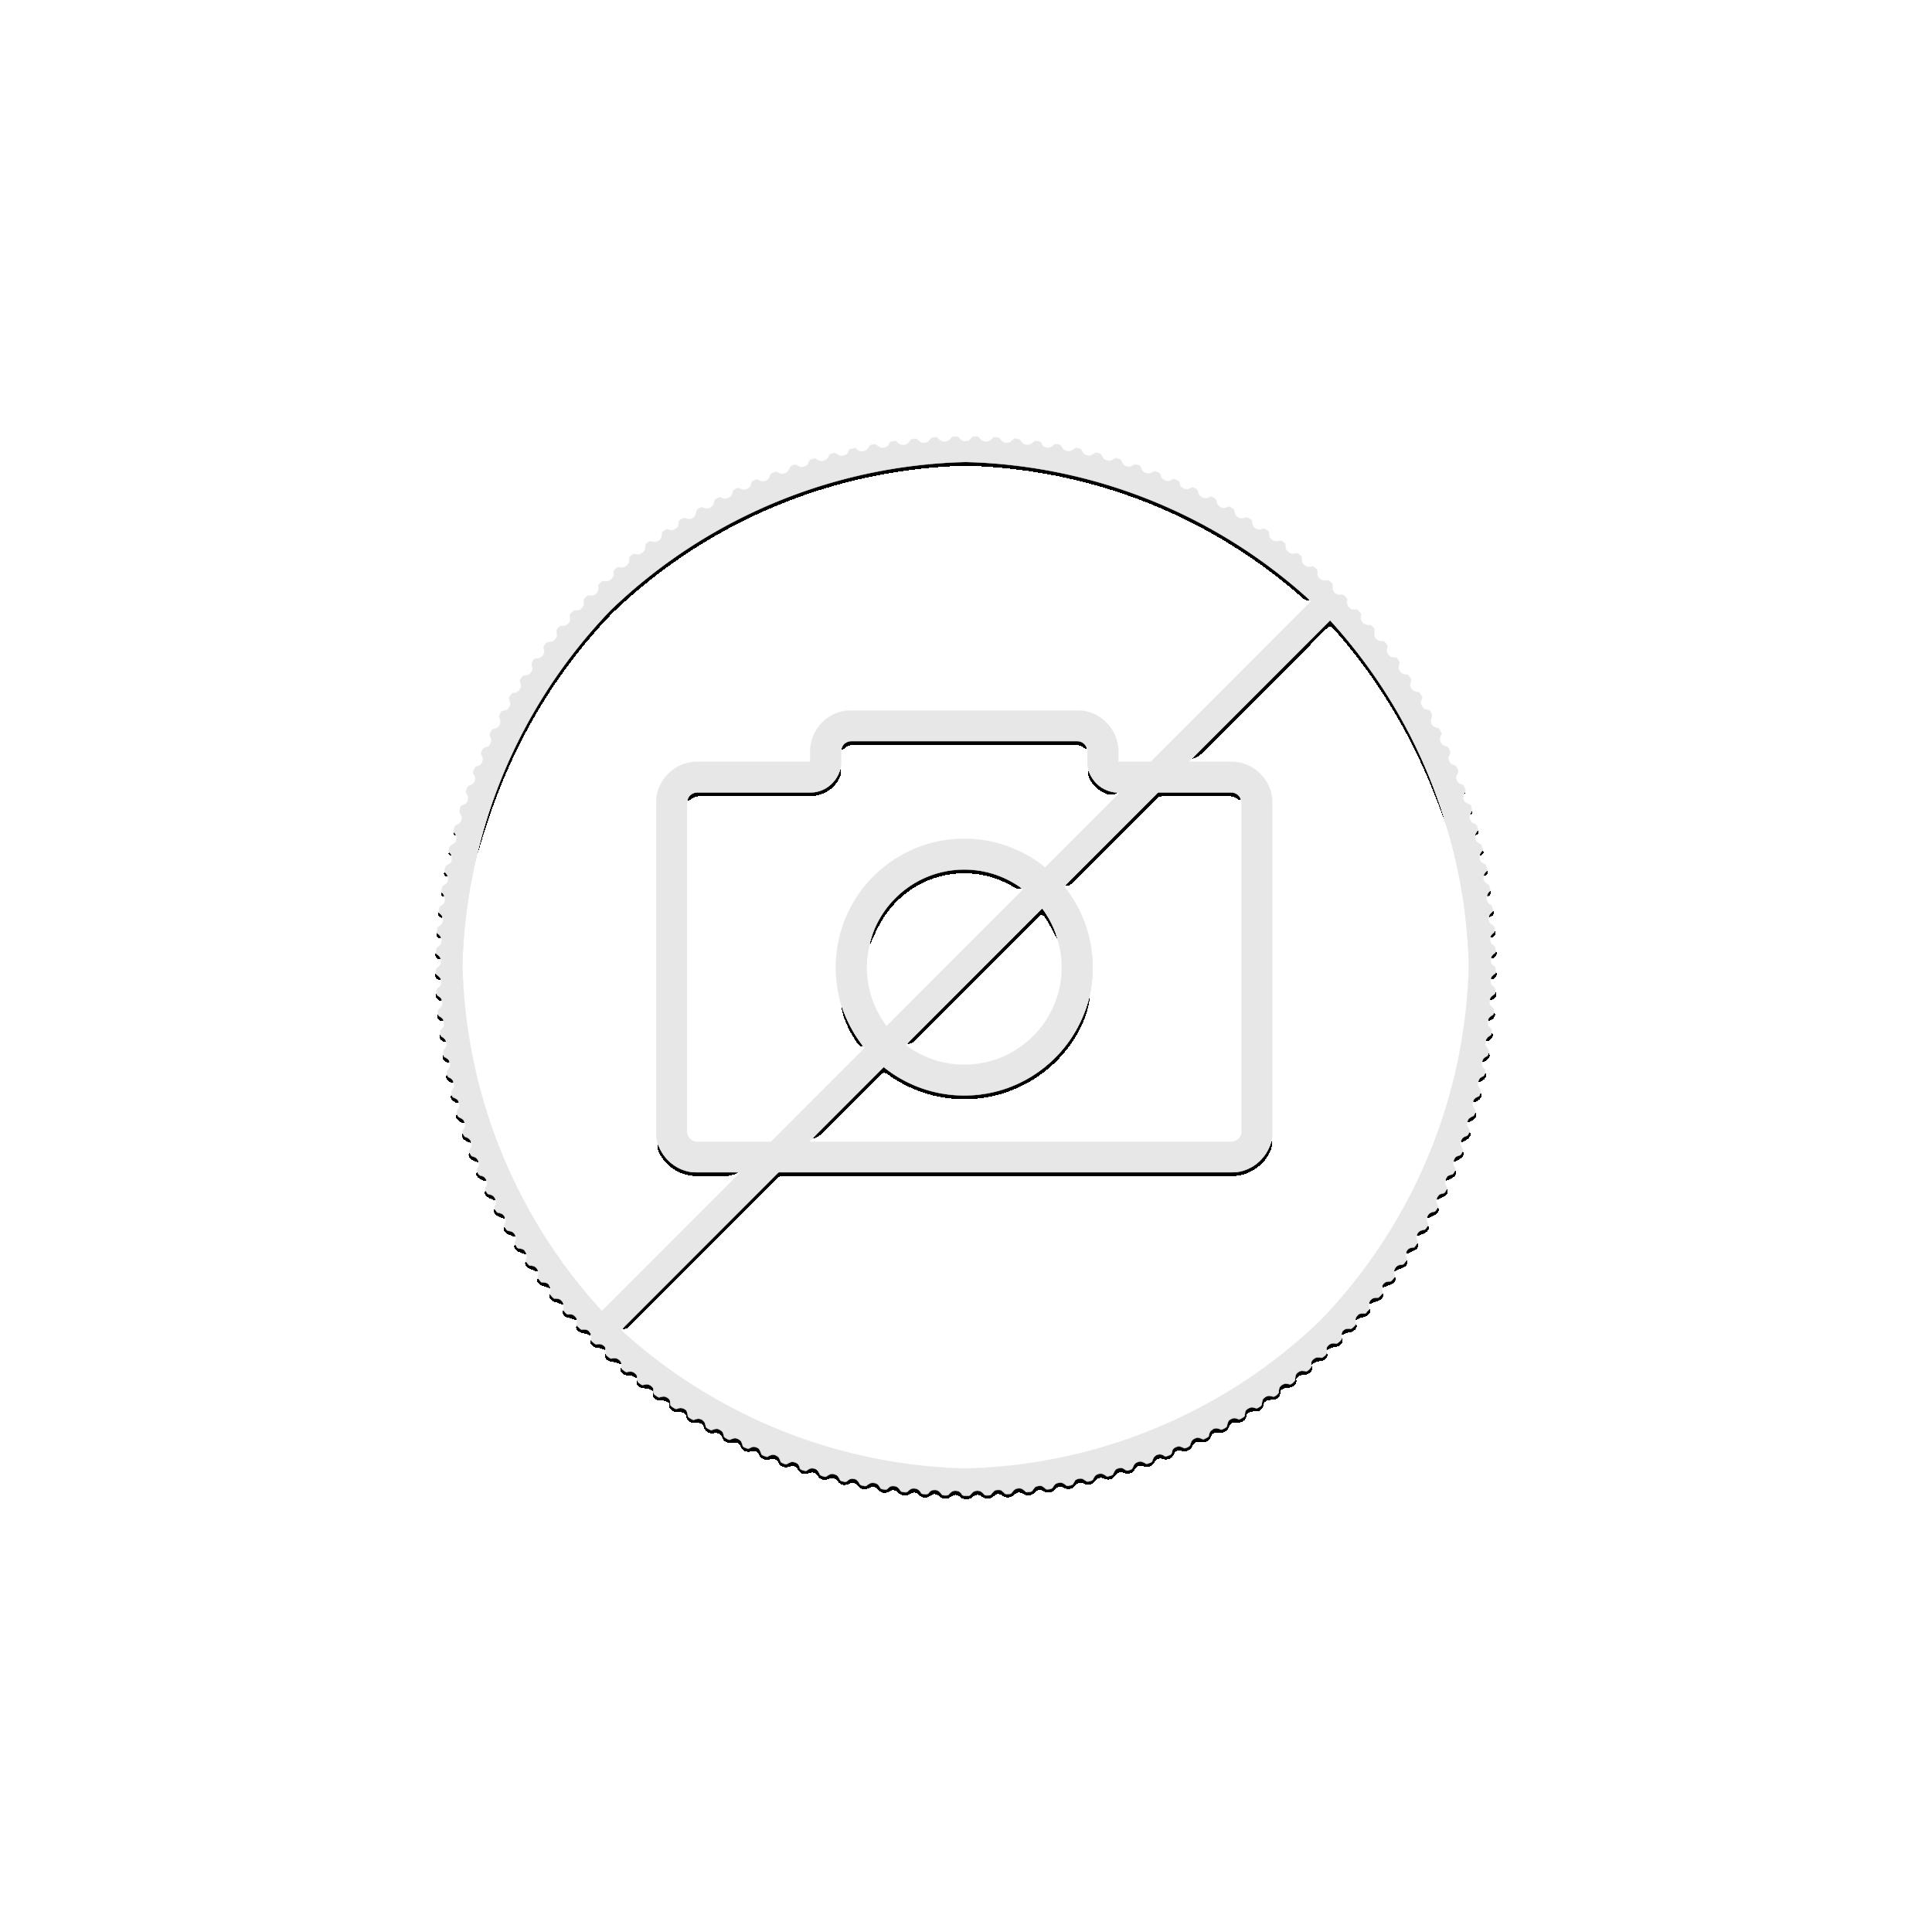 Special: Gouden 99,999% Maple Leaf munt 2008